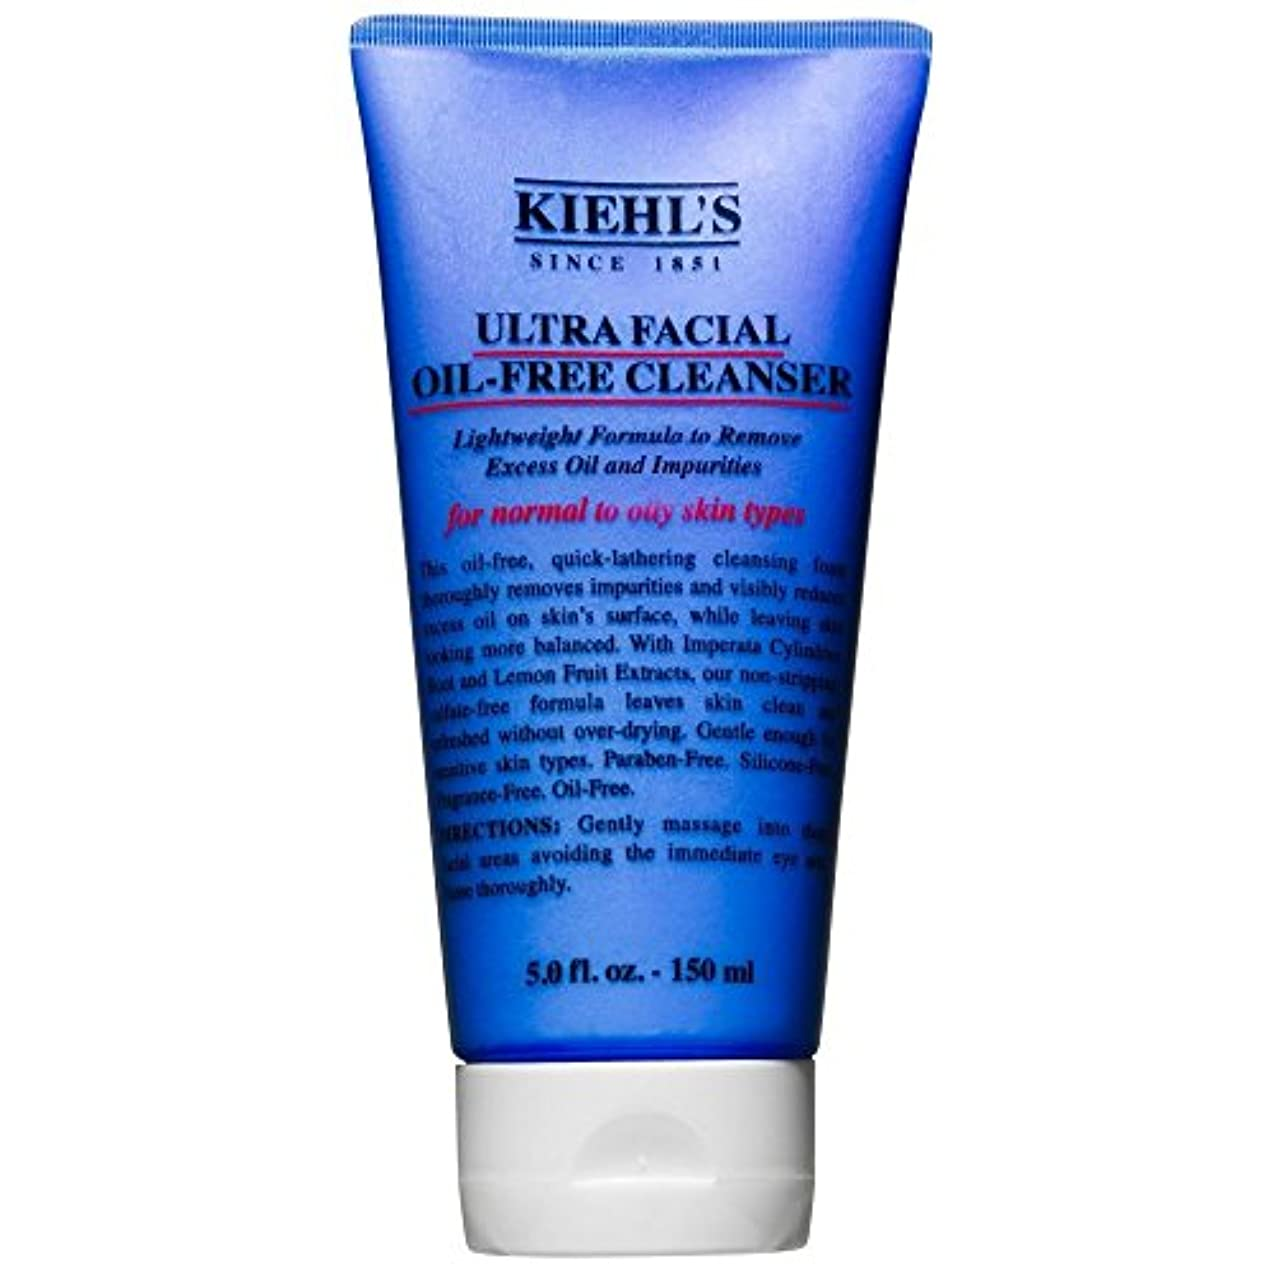 [Kiehl's] キールズウルトラフェイシャルオイルフリークレンザー、150ミリリットル - Kiehl's Ultra Facial Oil-Free Cleanser, 150ml [並行輸入品]